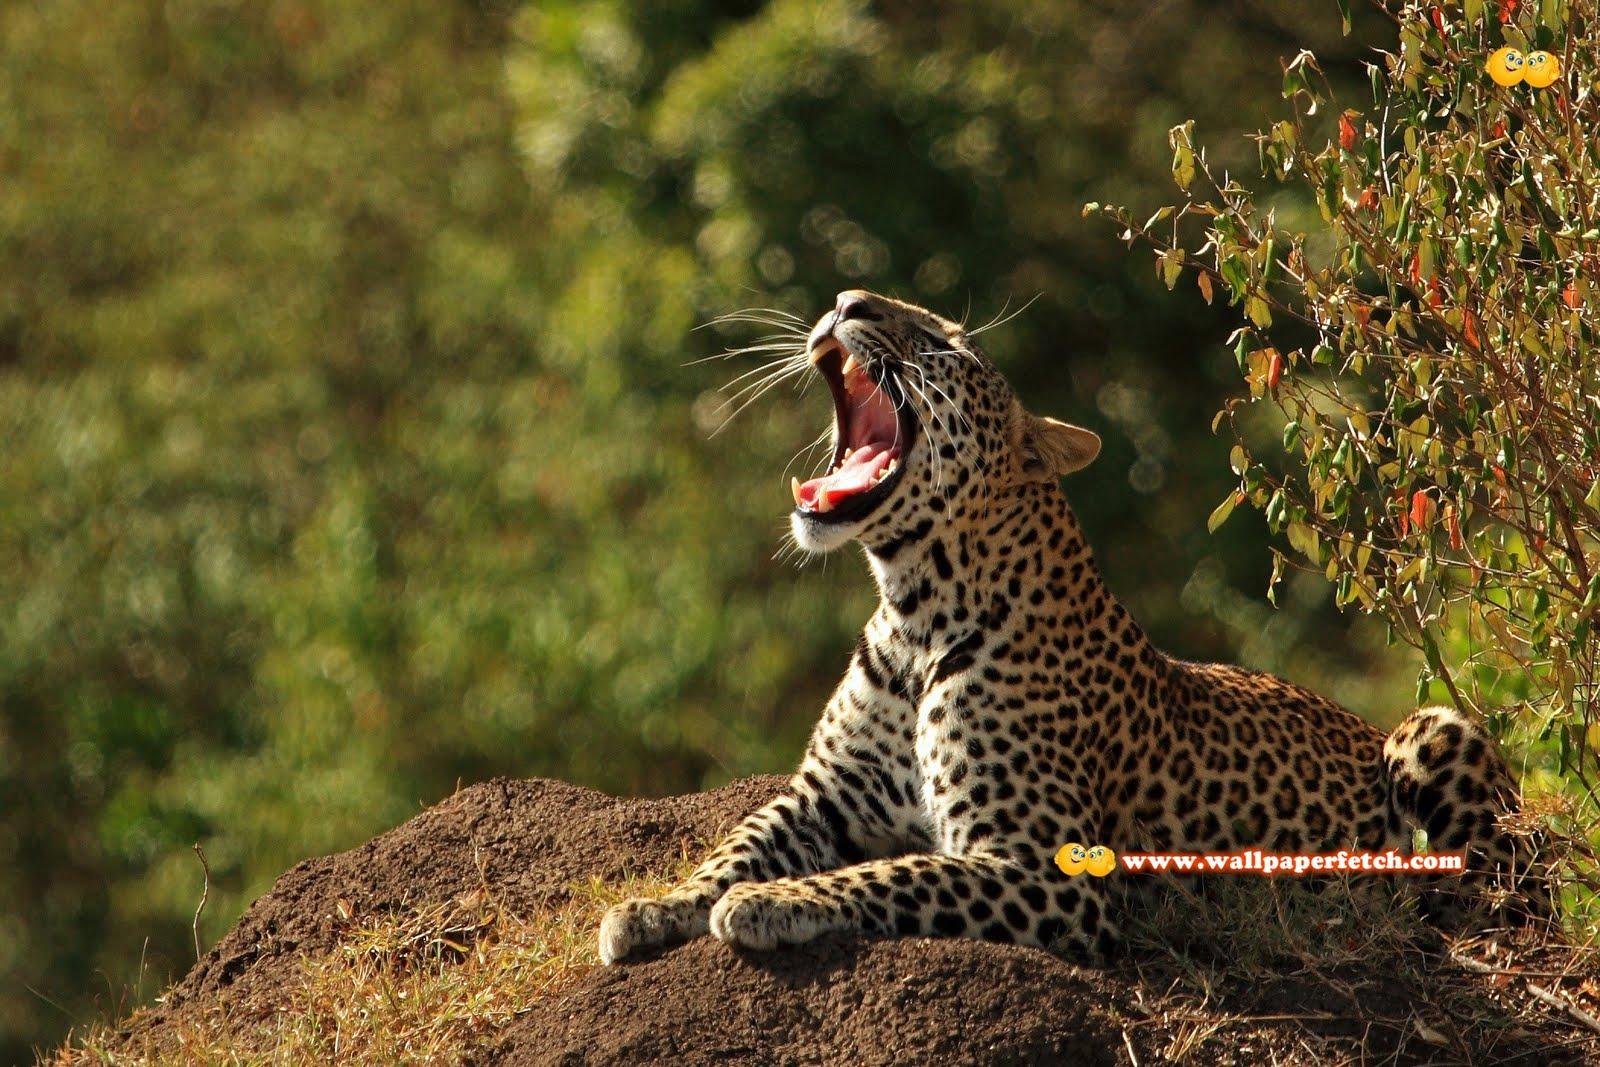 Wallpaper Fetch: 40 Beautiful Animal HD Wallpapers